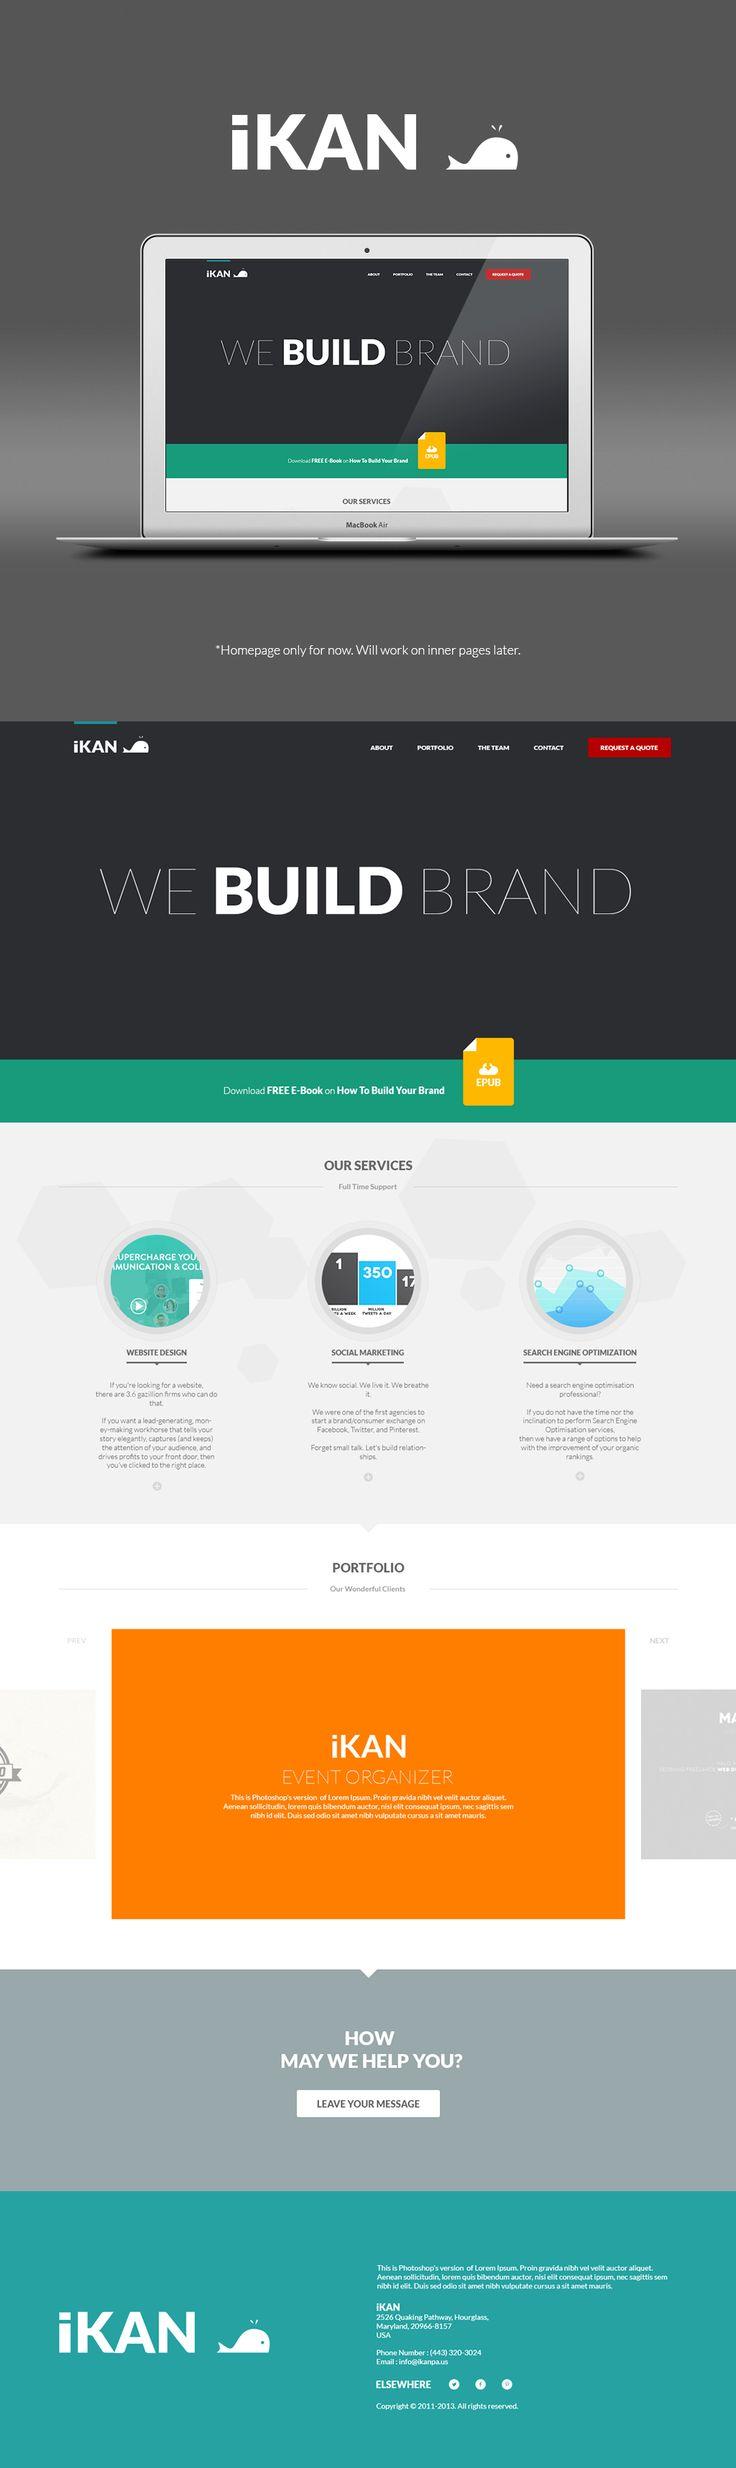 iKAN Flat Design Concept by leoaw.deviantart.com on @deviantART #flat #design #webdesign